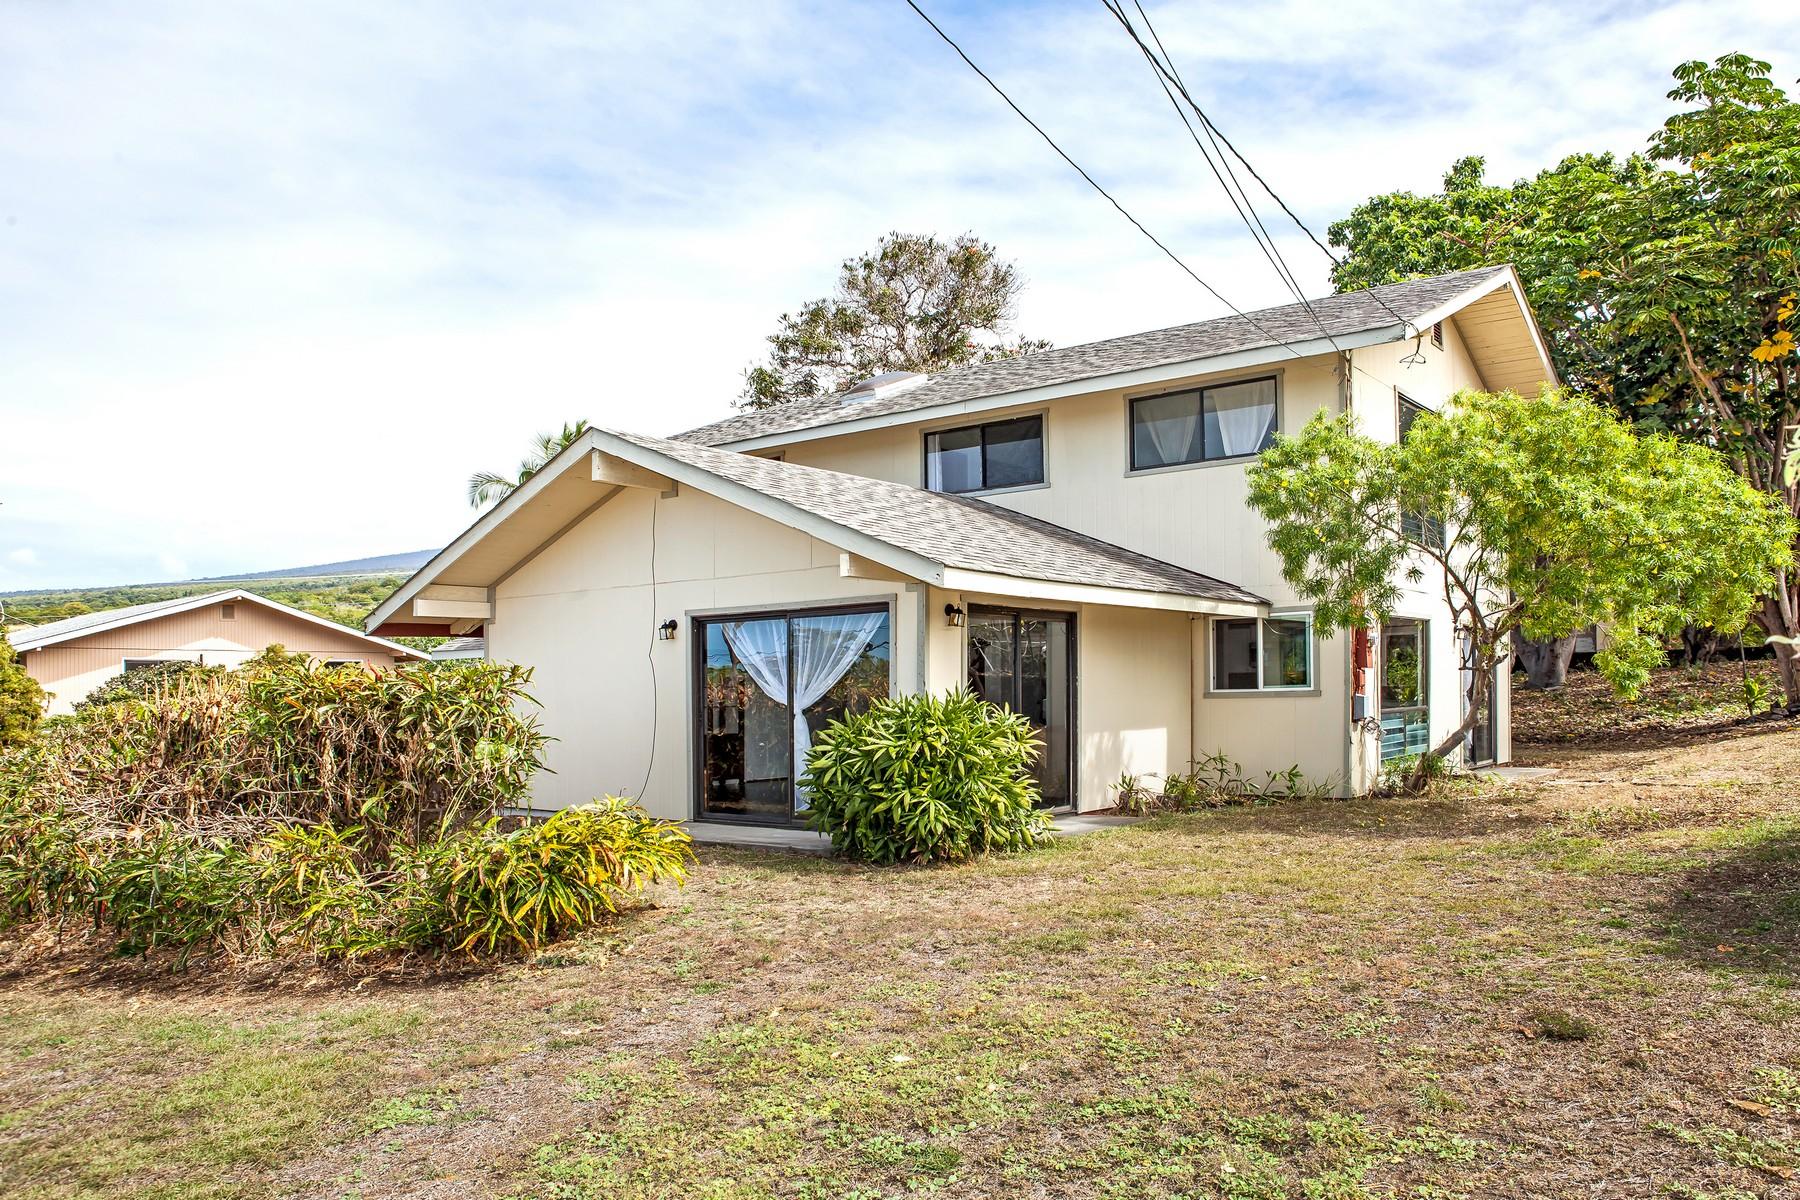 獨棟家庭住宅 為 出售 在 Kailua View Estates Subdivision 75-5807 Nalukai Pl Kailua, 夏威夷, 96740 美國